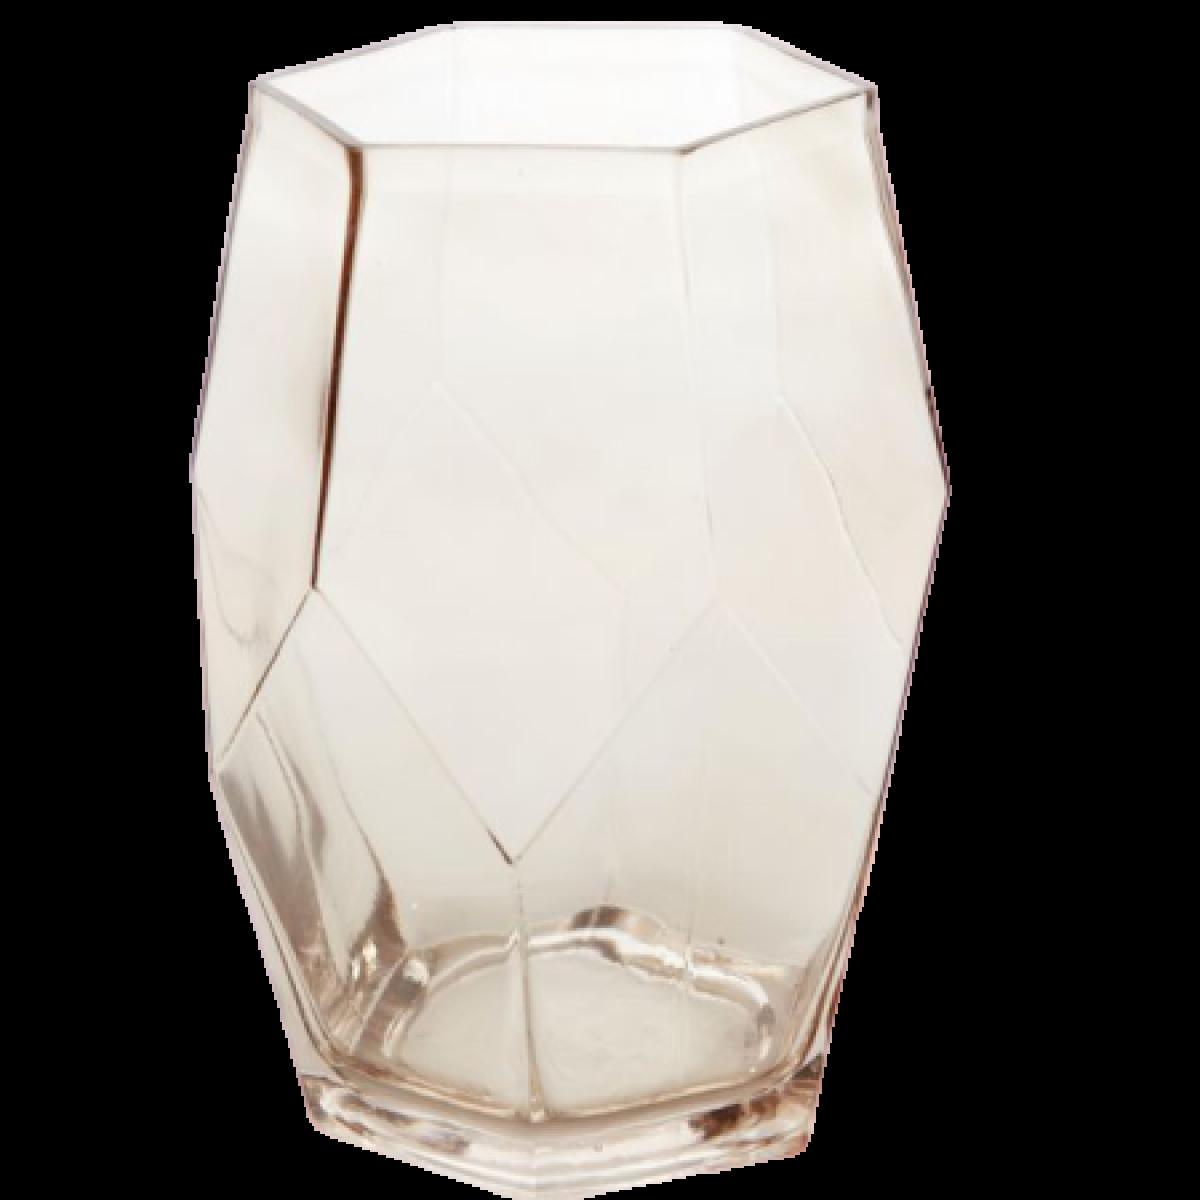 5605 Ruboid Vase Gold Tint 14.5x18x24.5cm 5605 Glass